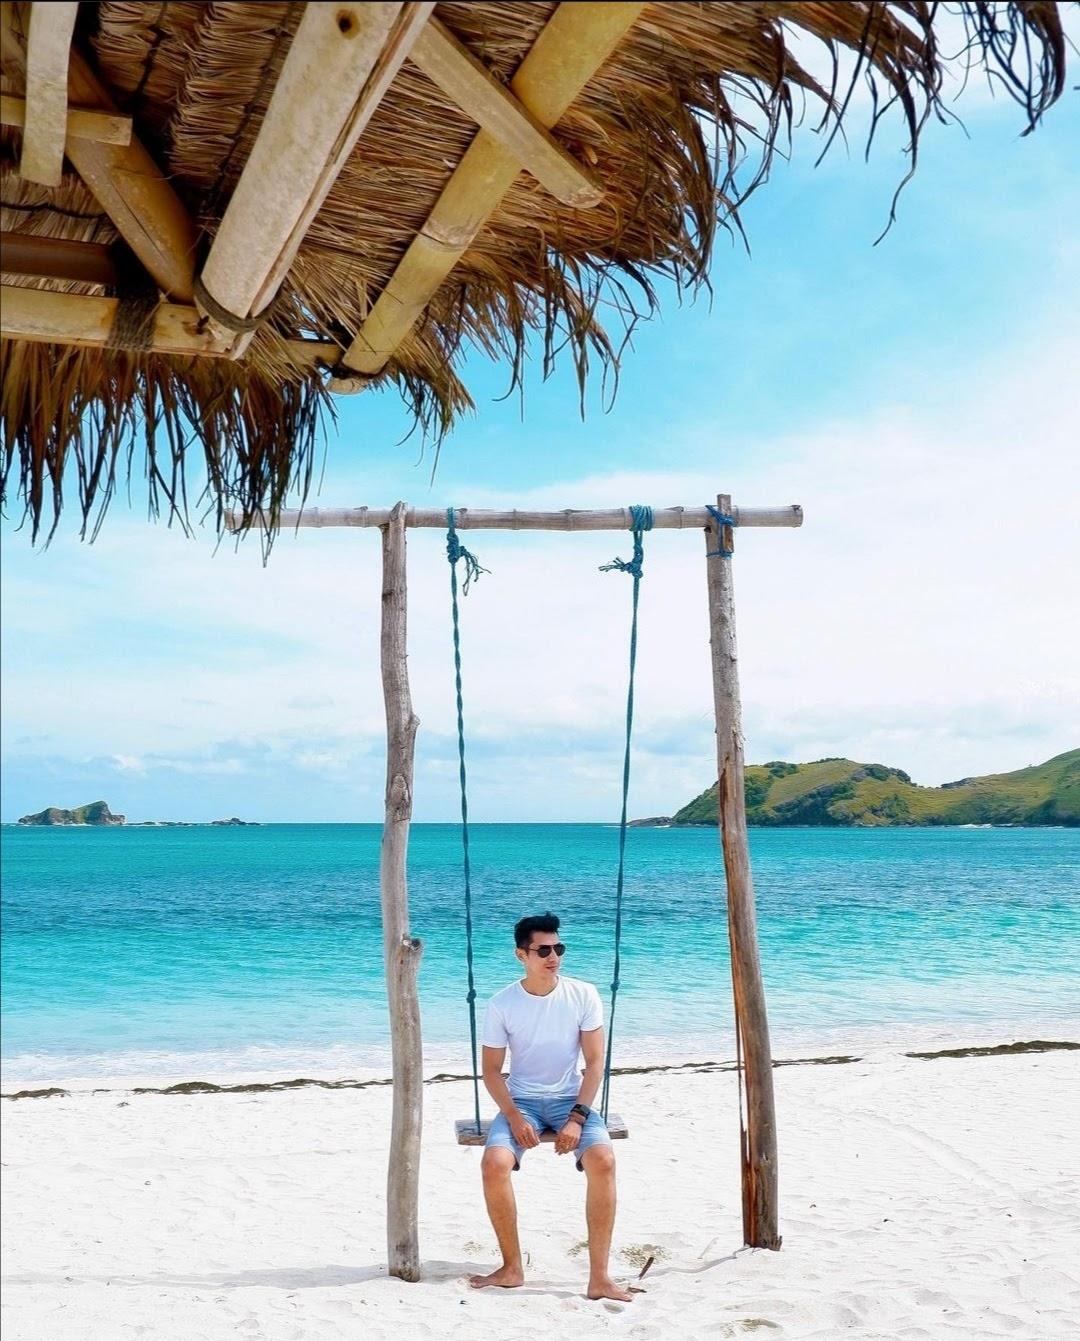 Pantai Pasir Putih Tanjung Aan